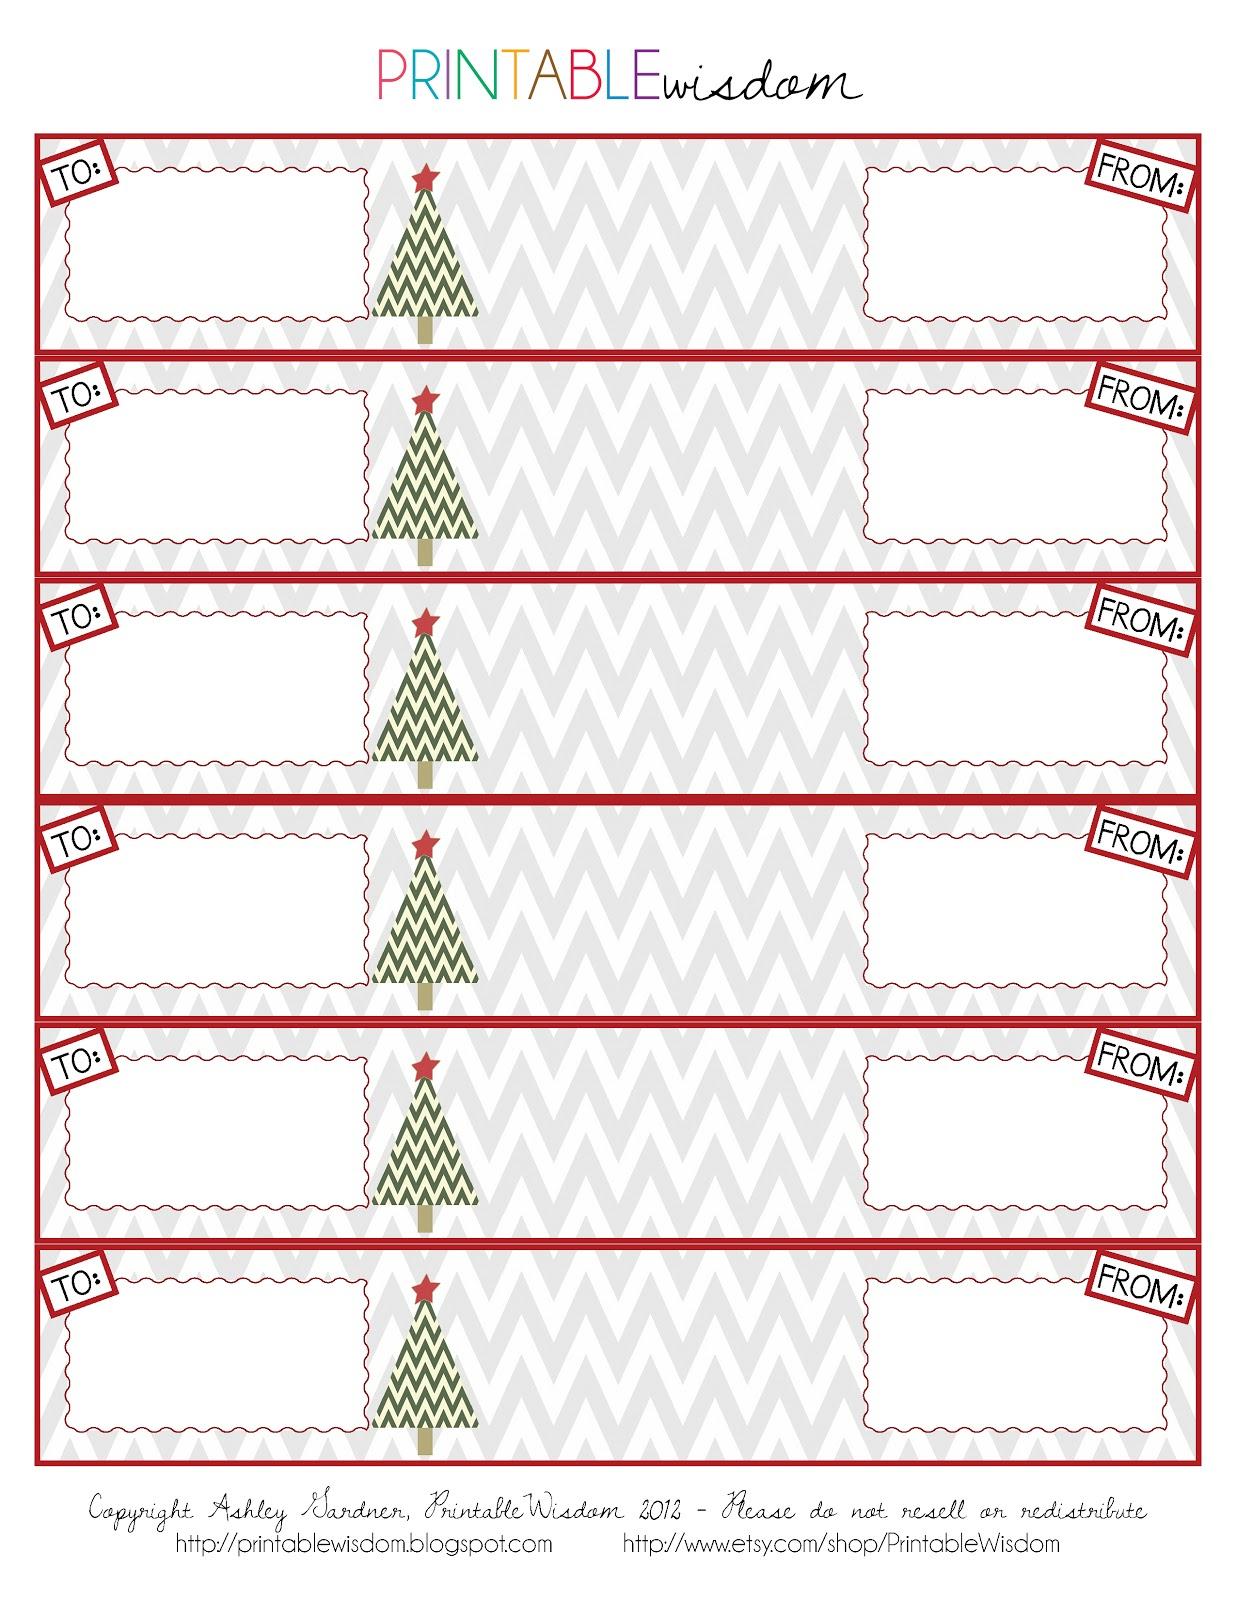 012 Template Ideas Address Label Templates Free Printable Christmas - Free Printable Address Label Templates